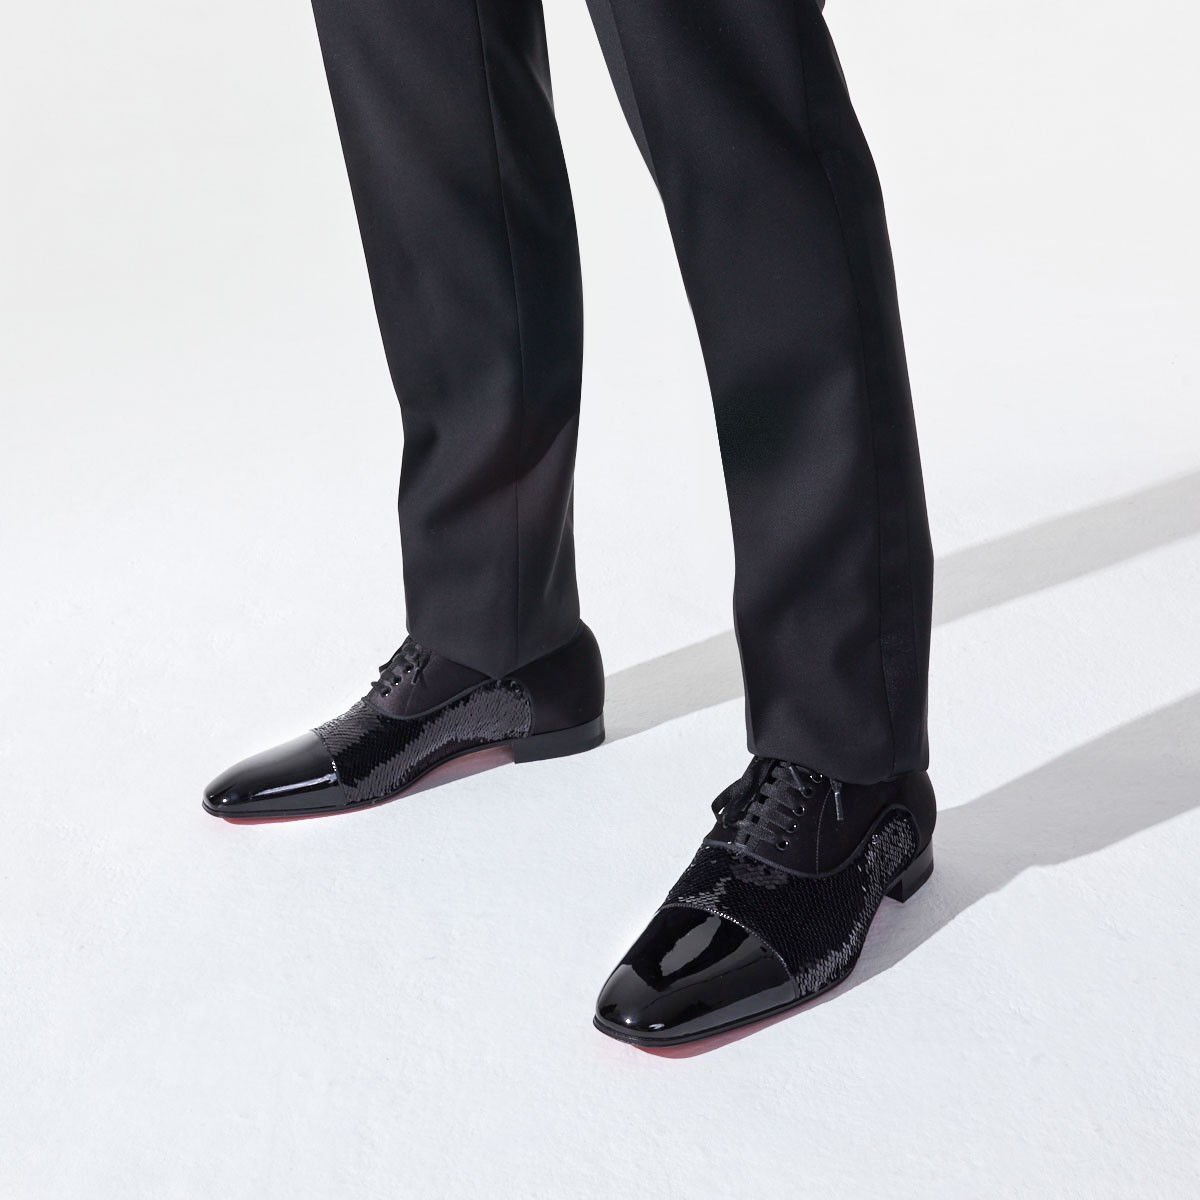 Shoes - Greggo Orlato - Christian Louboutin